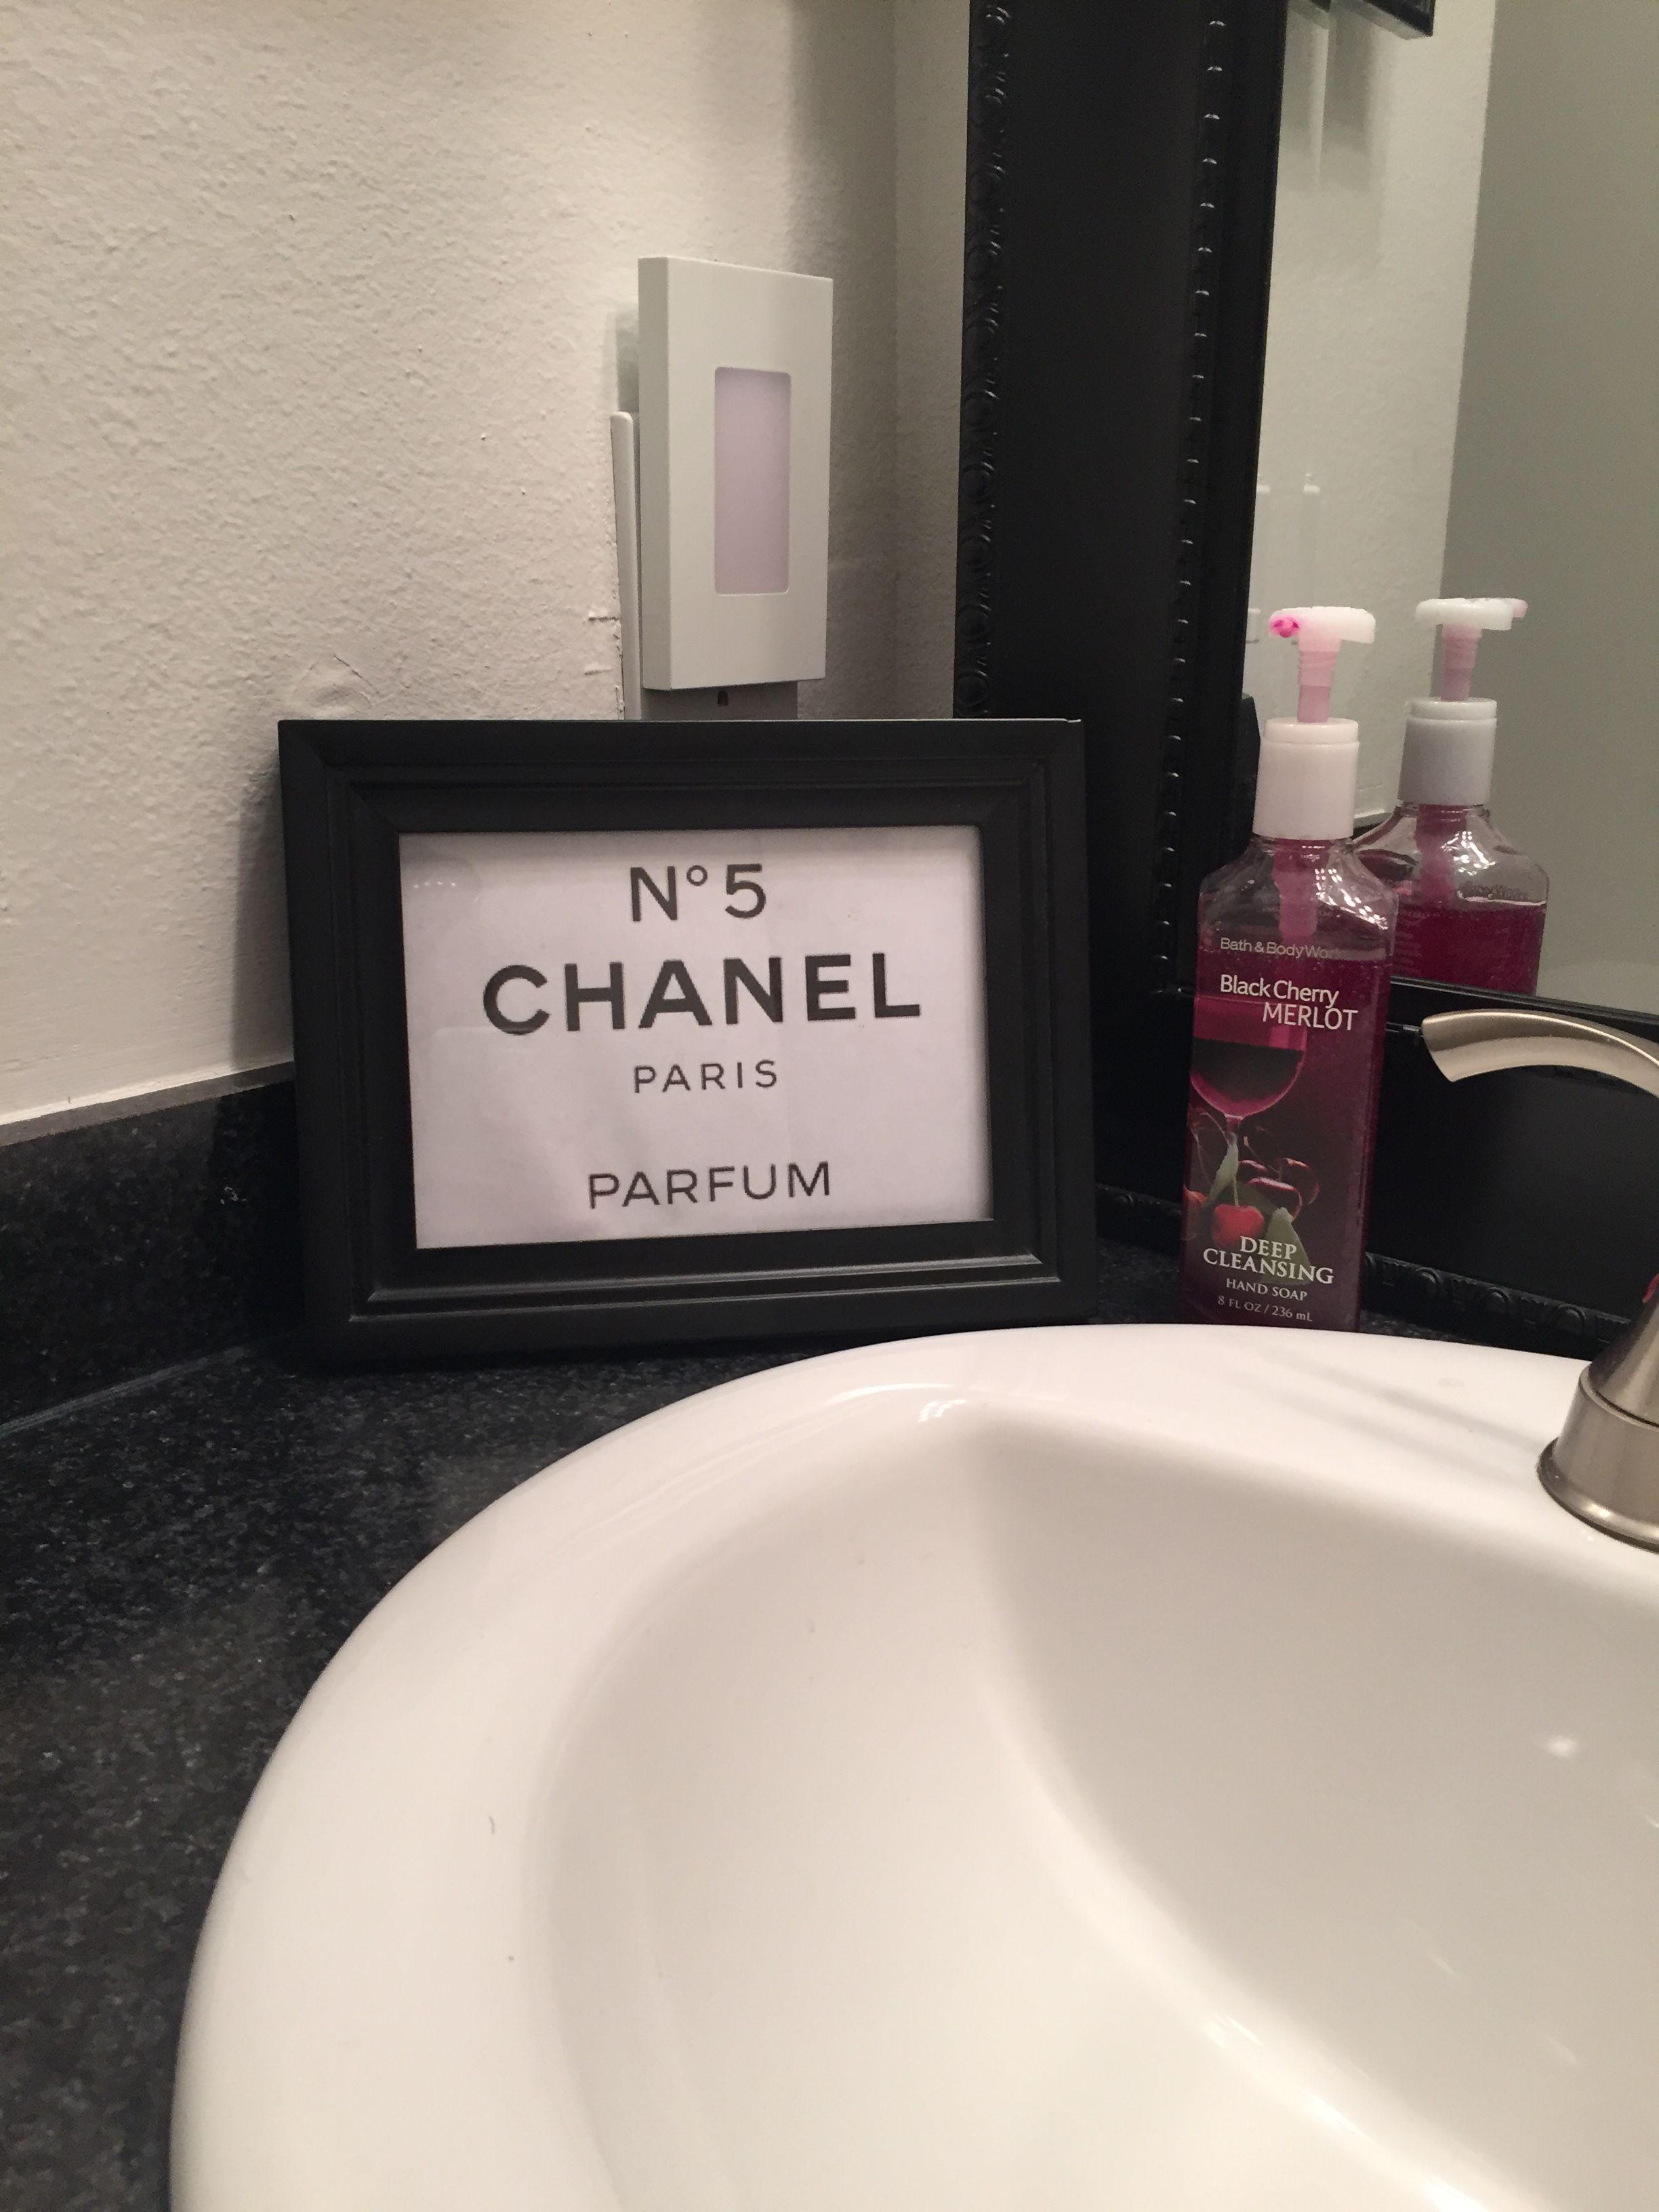 Chanel Number 5 Inspired Bathroom Decor Diy Art Projects Diy